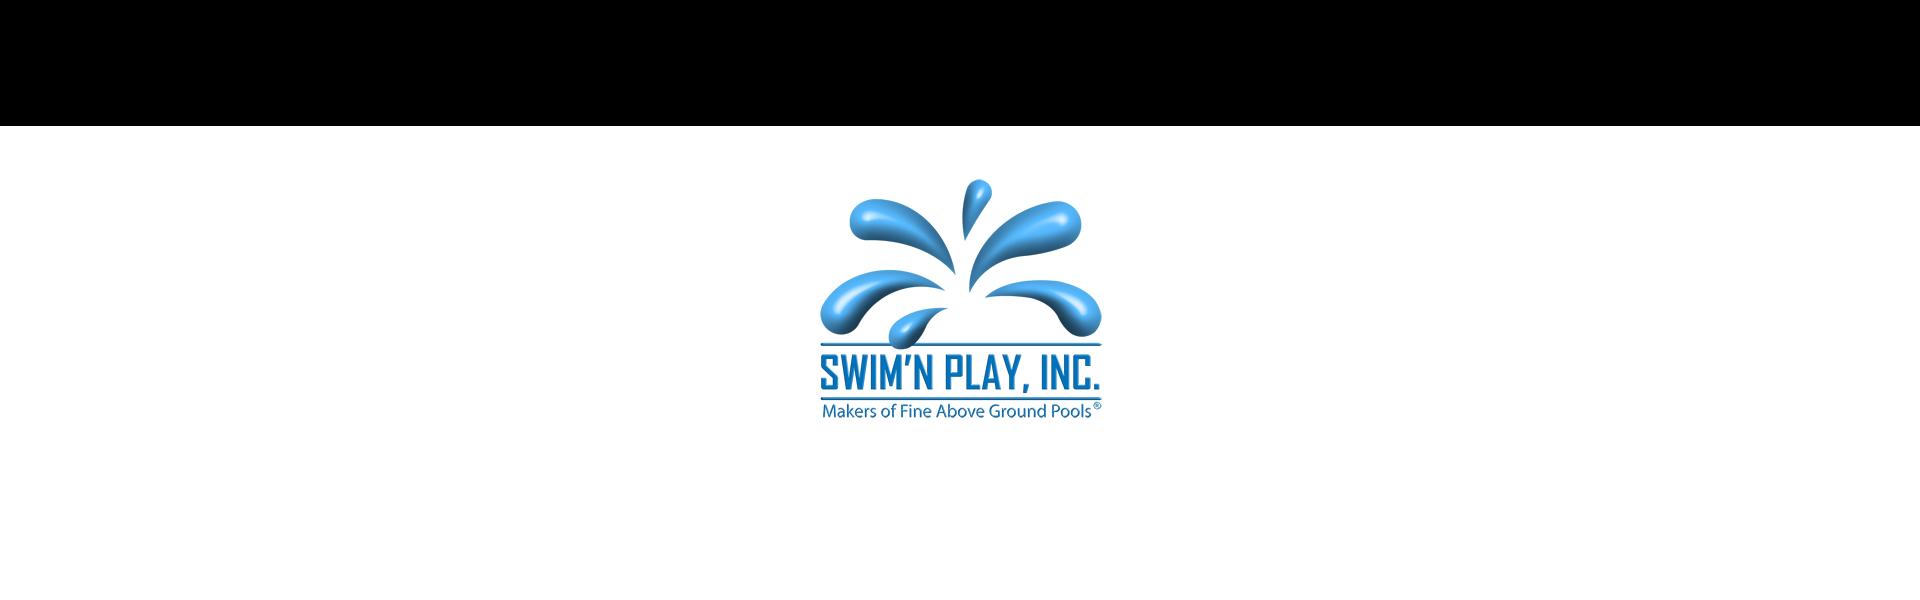 swim-n-play-title-logo